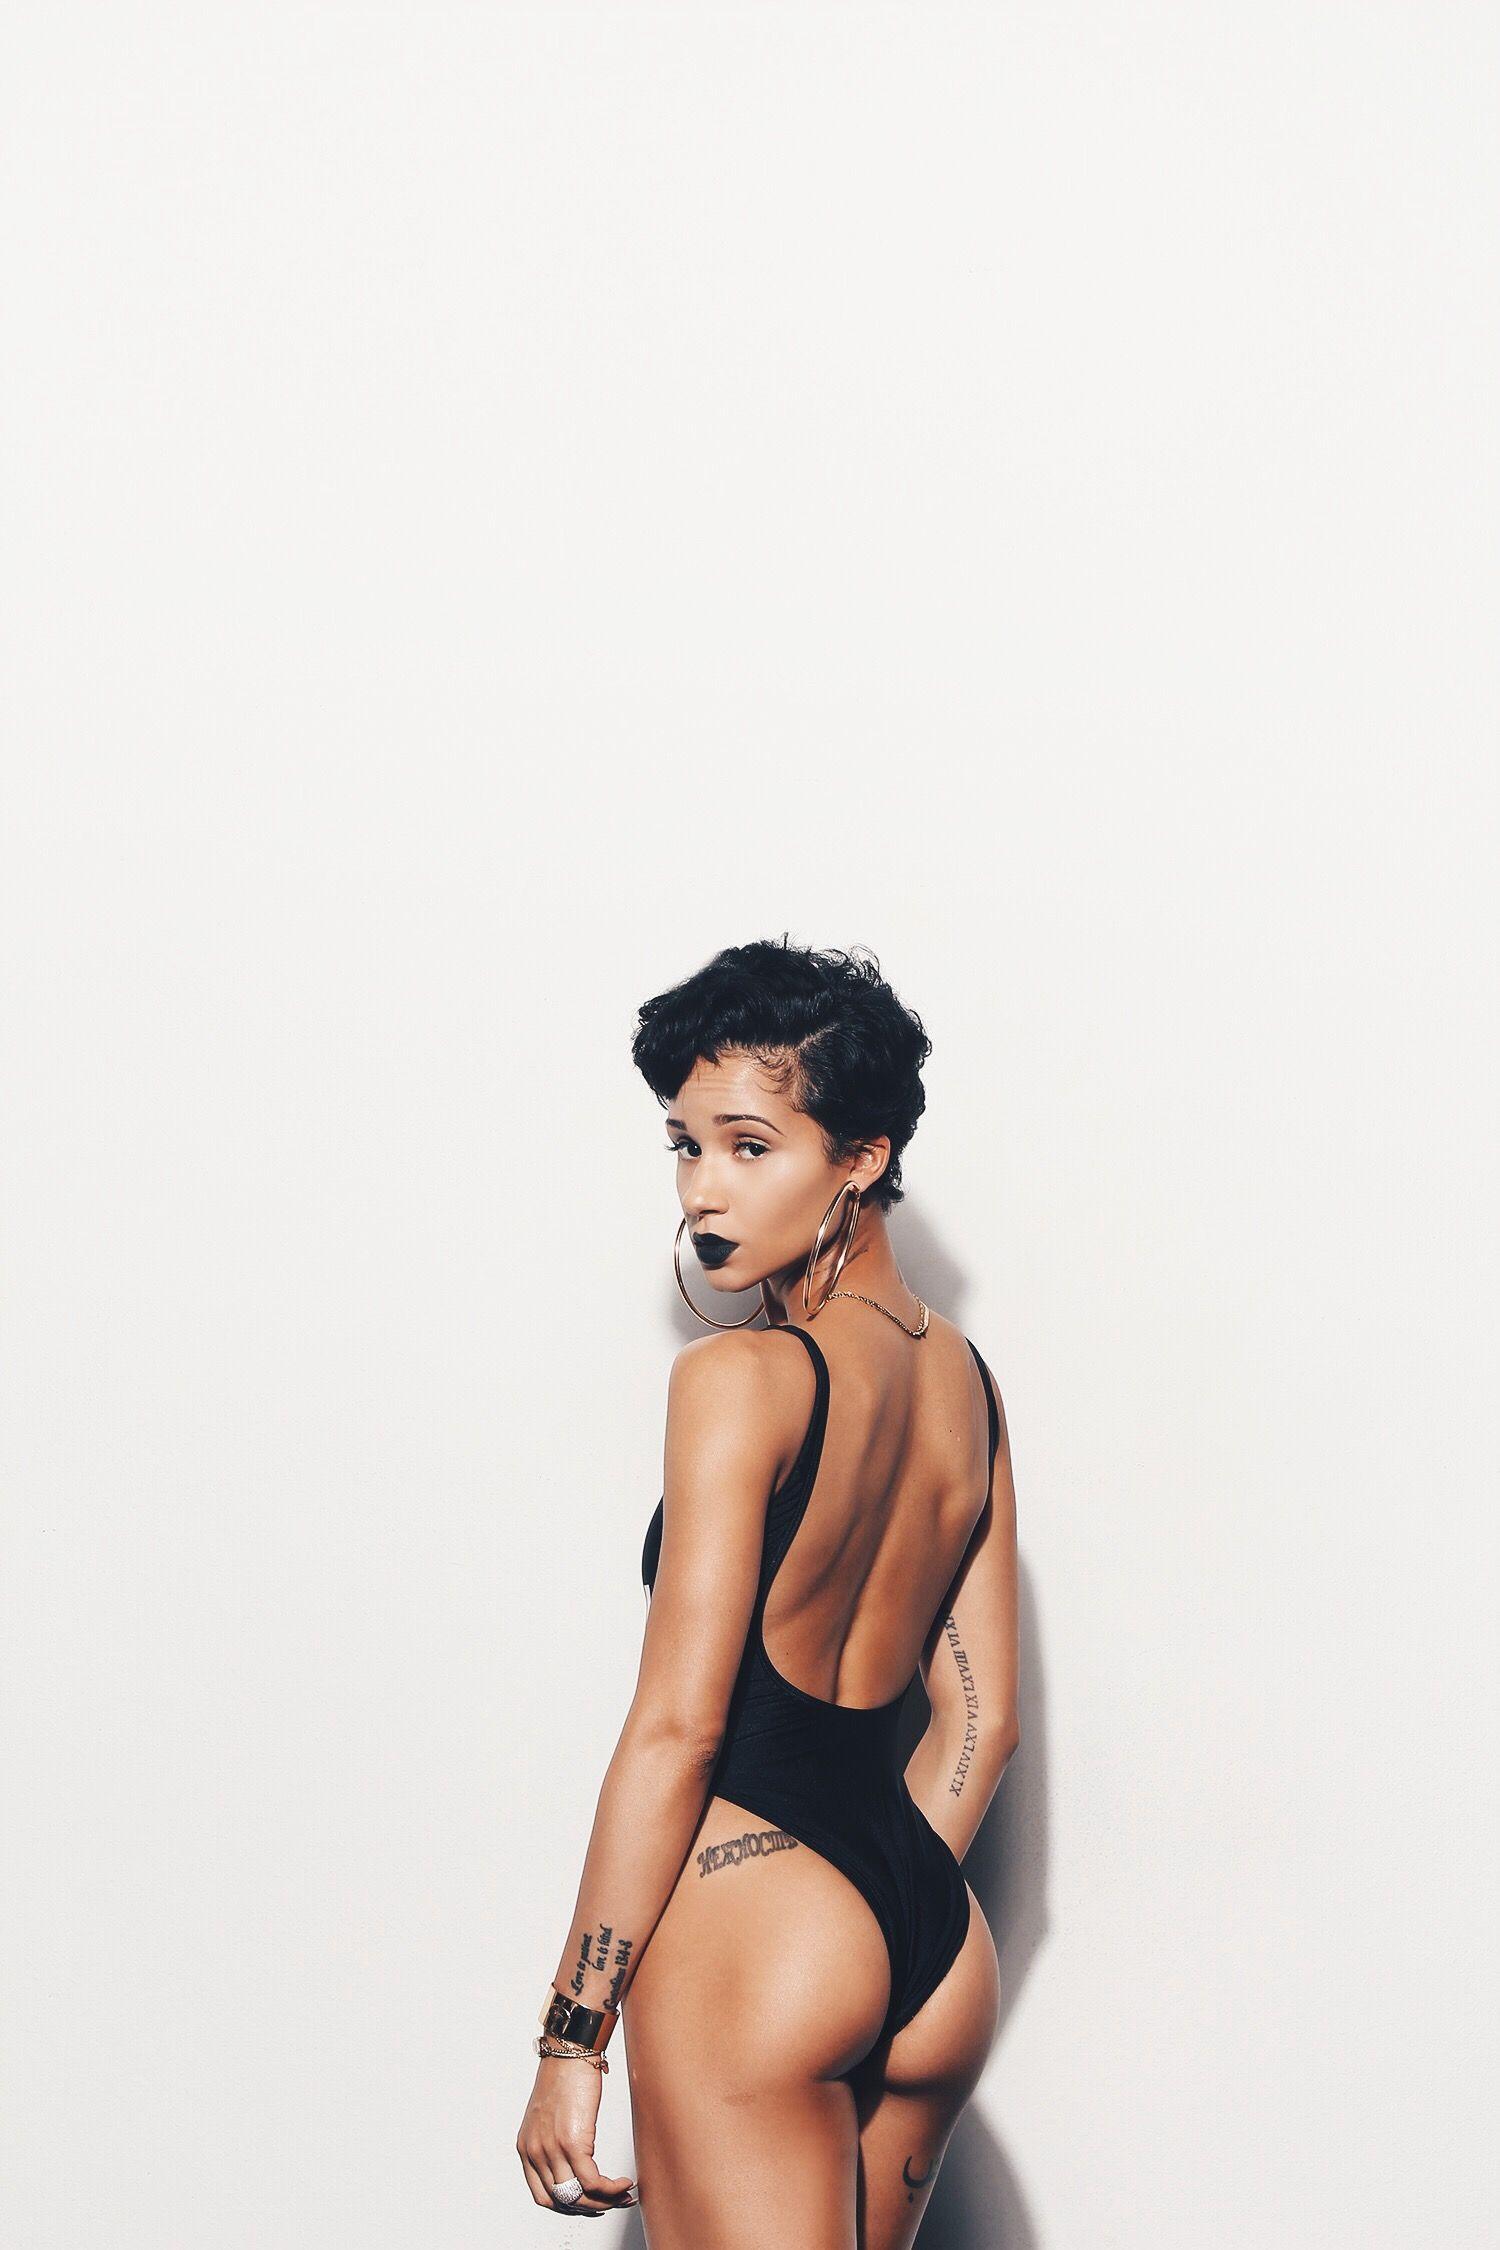 Video Tanaya Henry naked (41 photos), Pussy, Bikini, Boobs, lingerie 2020